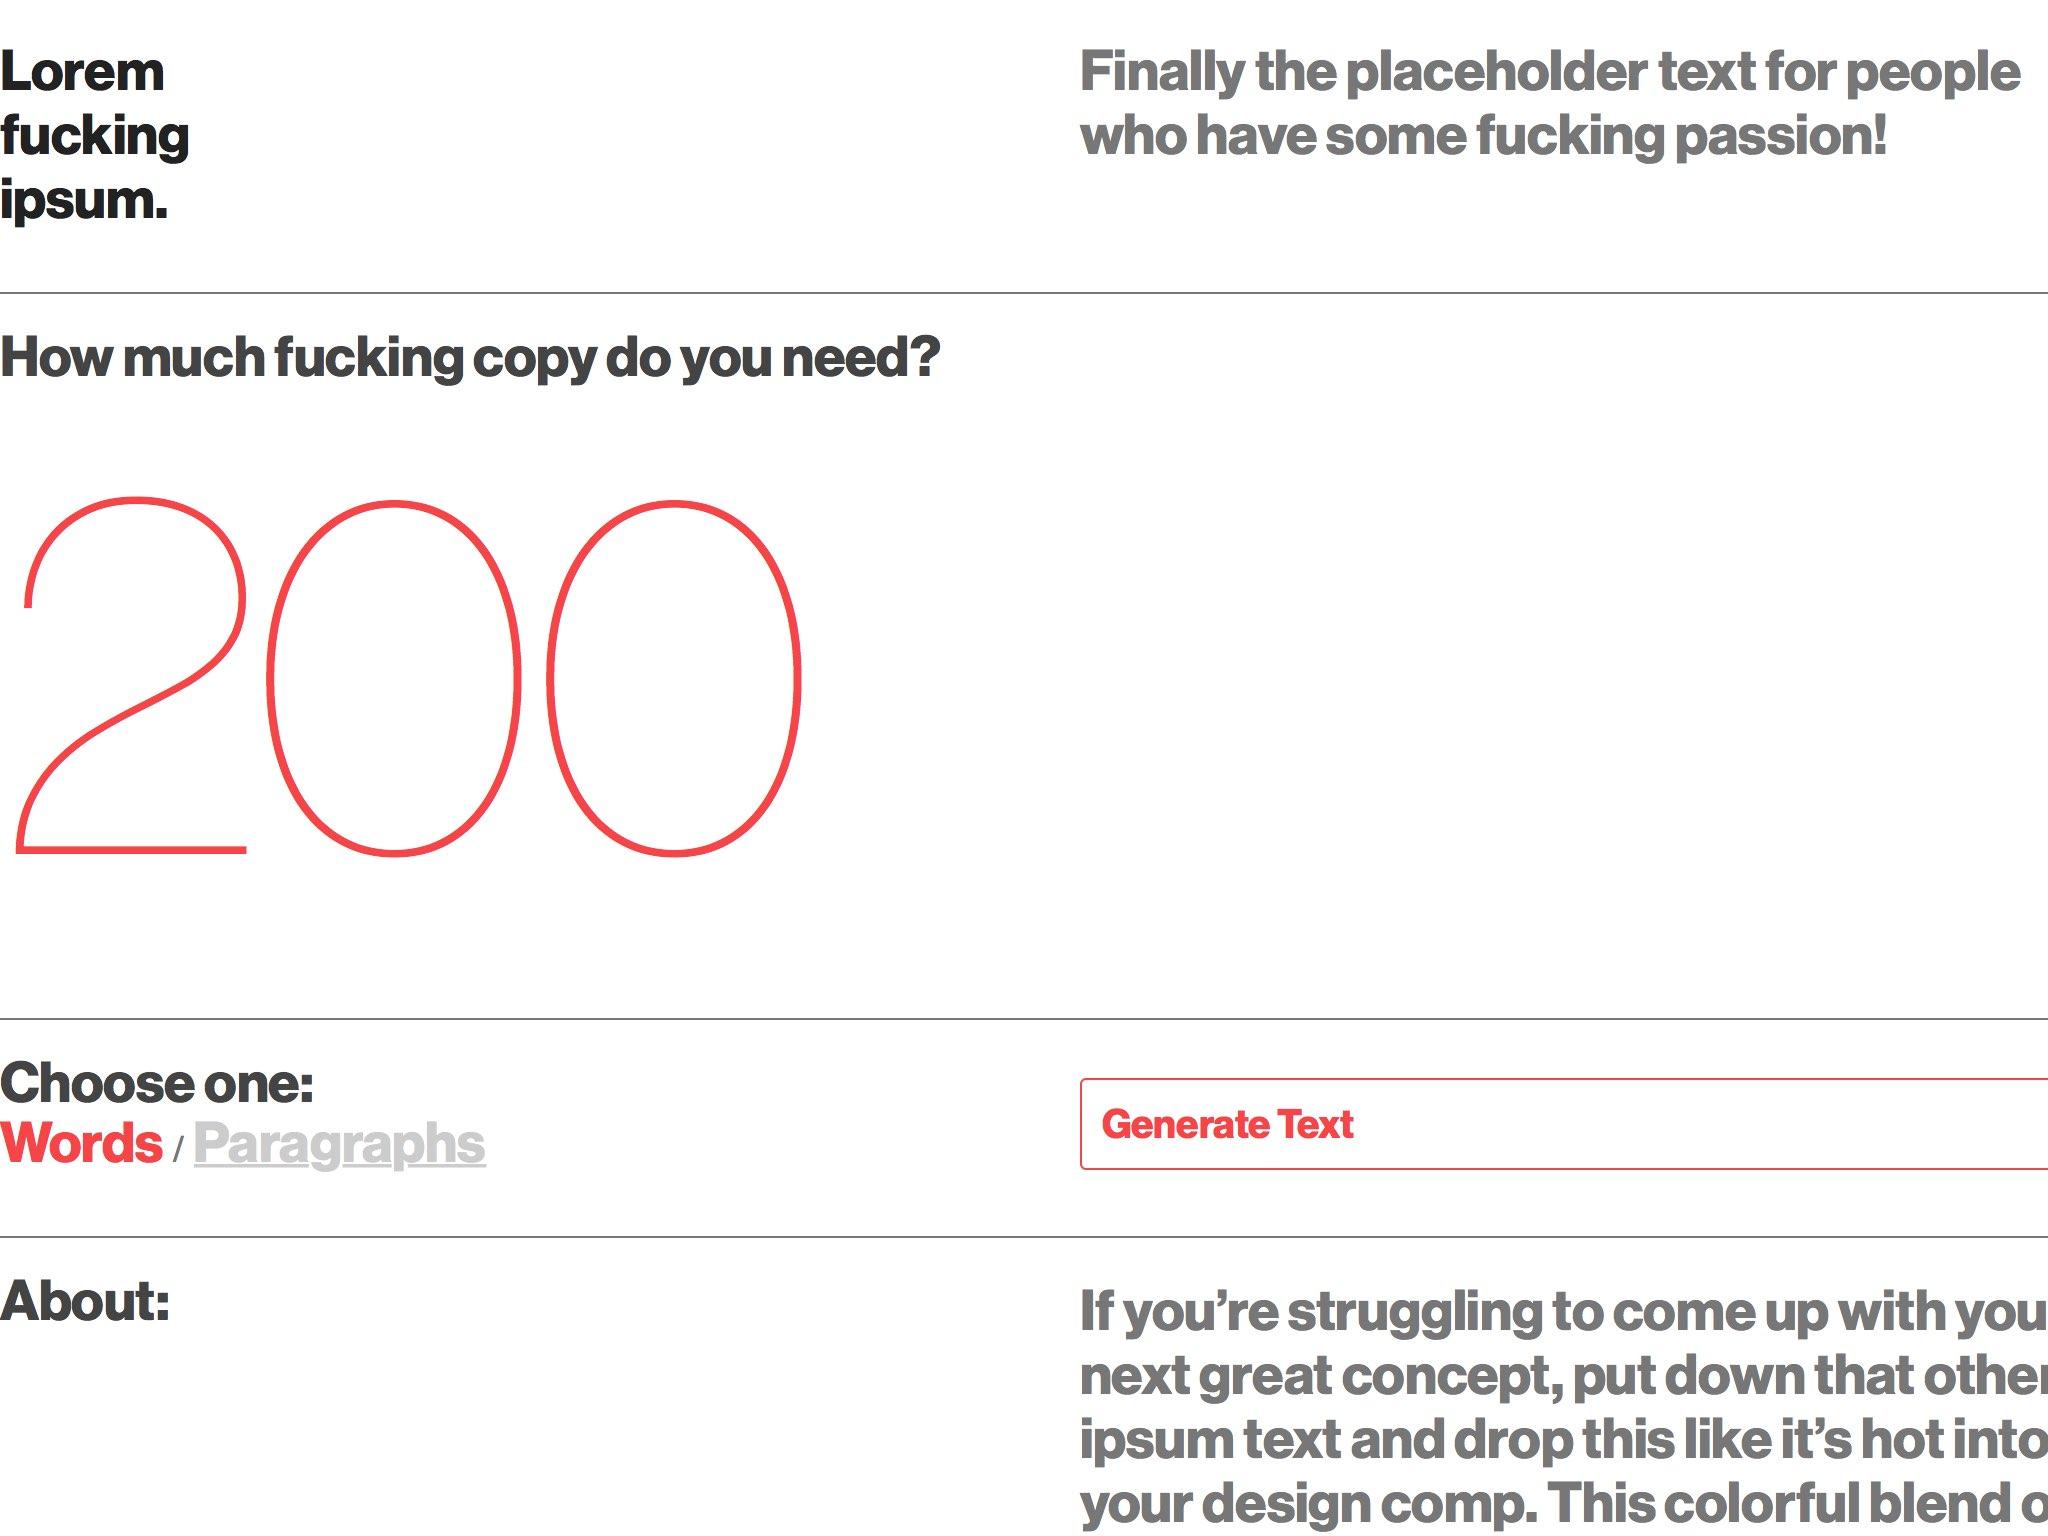 Lorem fucking ipsum: A Good Fucking Design Advice Service.